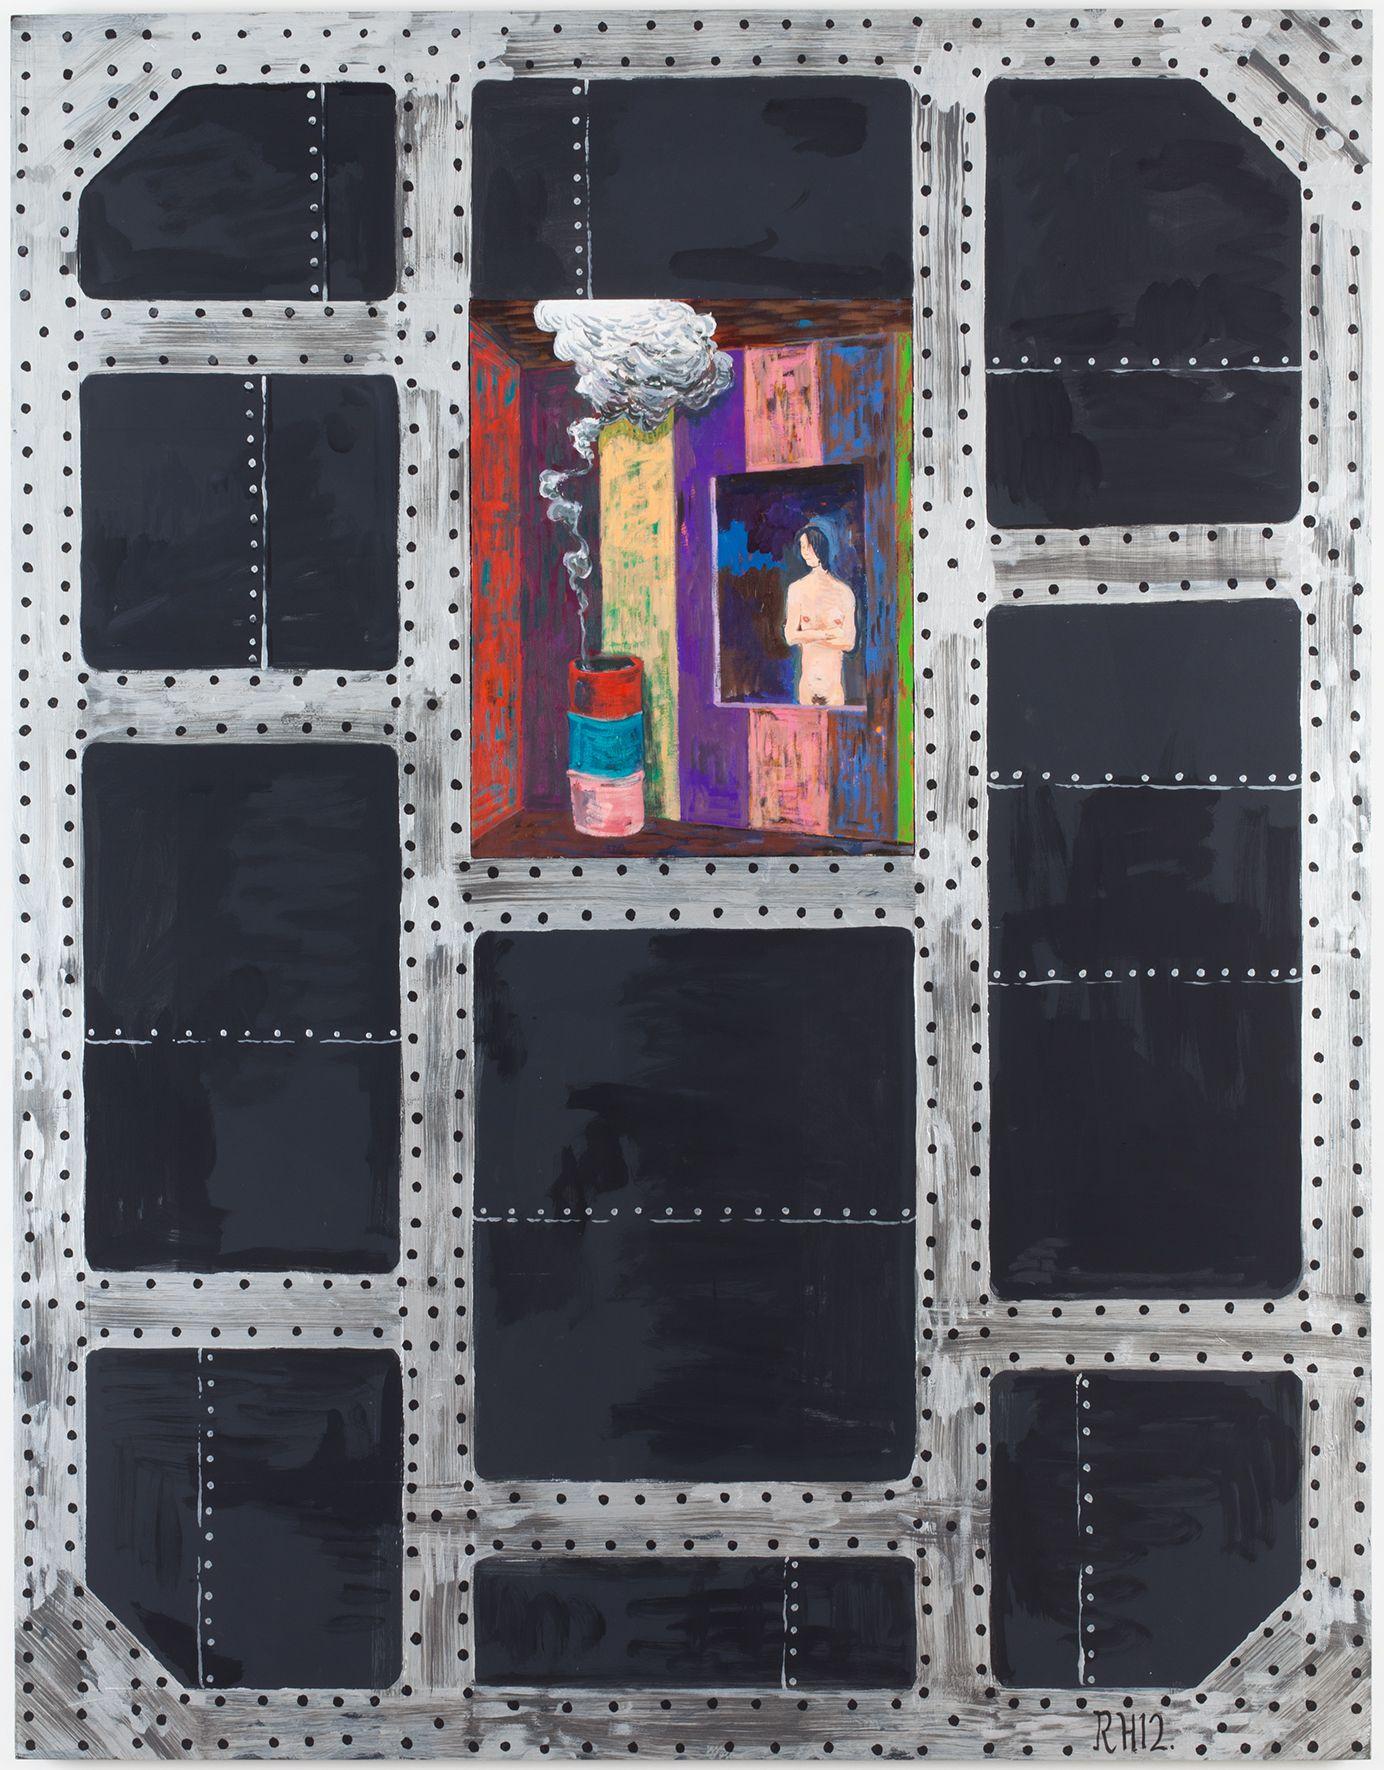 Richard Hawkins Brig #1: A coy fish, 2012 Oil on canvas and acrylic on panel 63 x 49 x 1 5/8 inches 160 x 124.5 x 4.1 cm